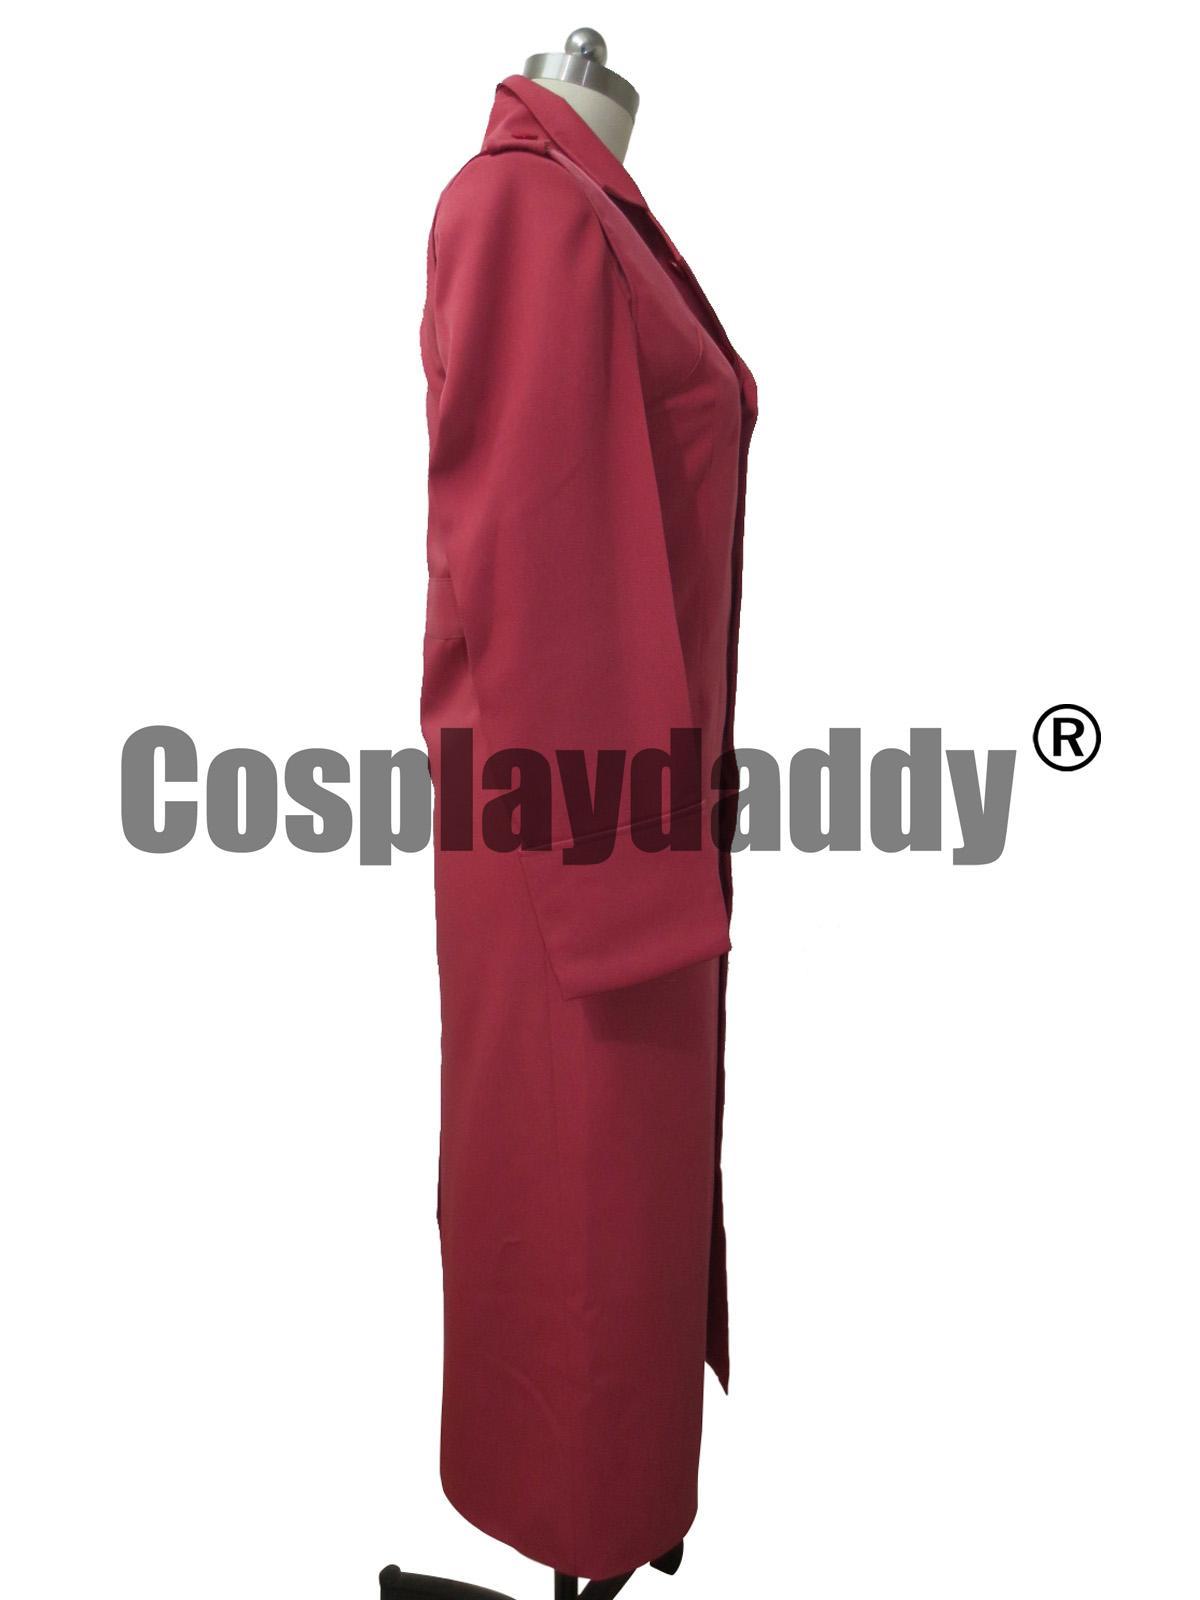 Costume cosplay lungo cappotto Foxhound lungo